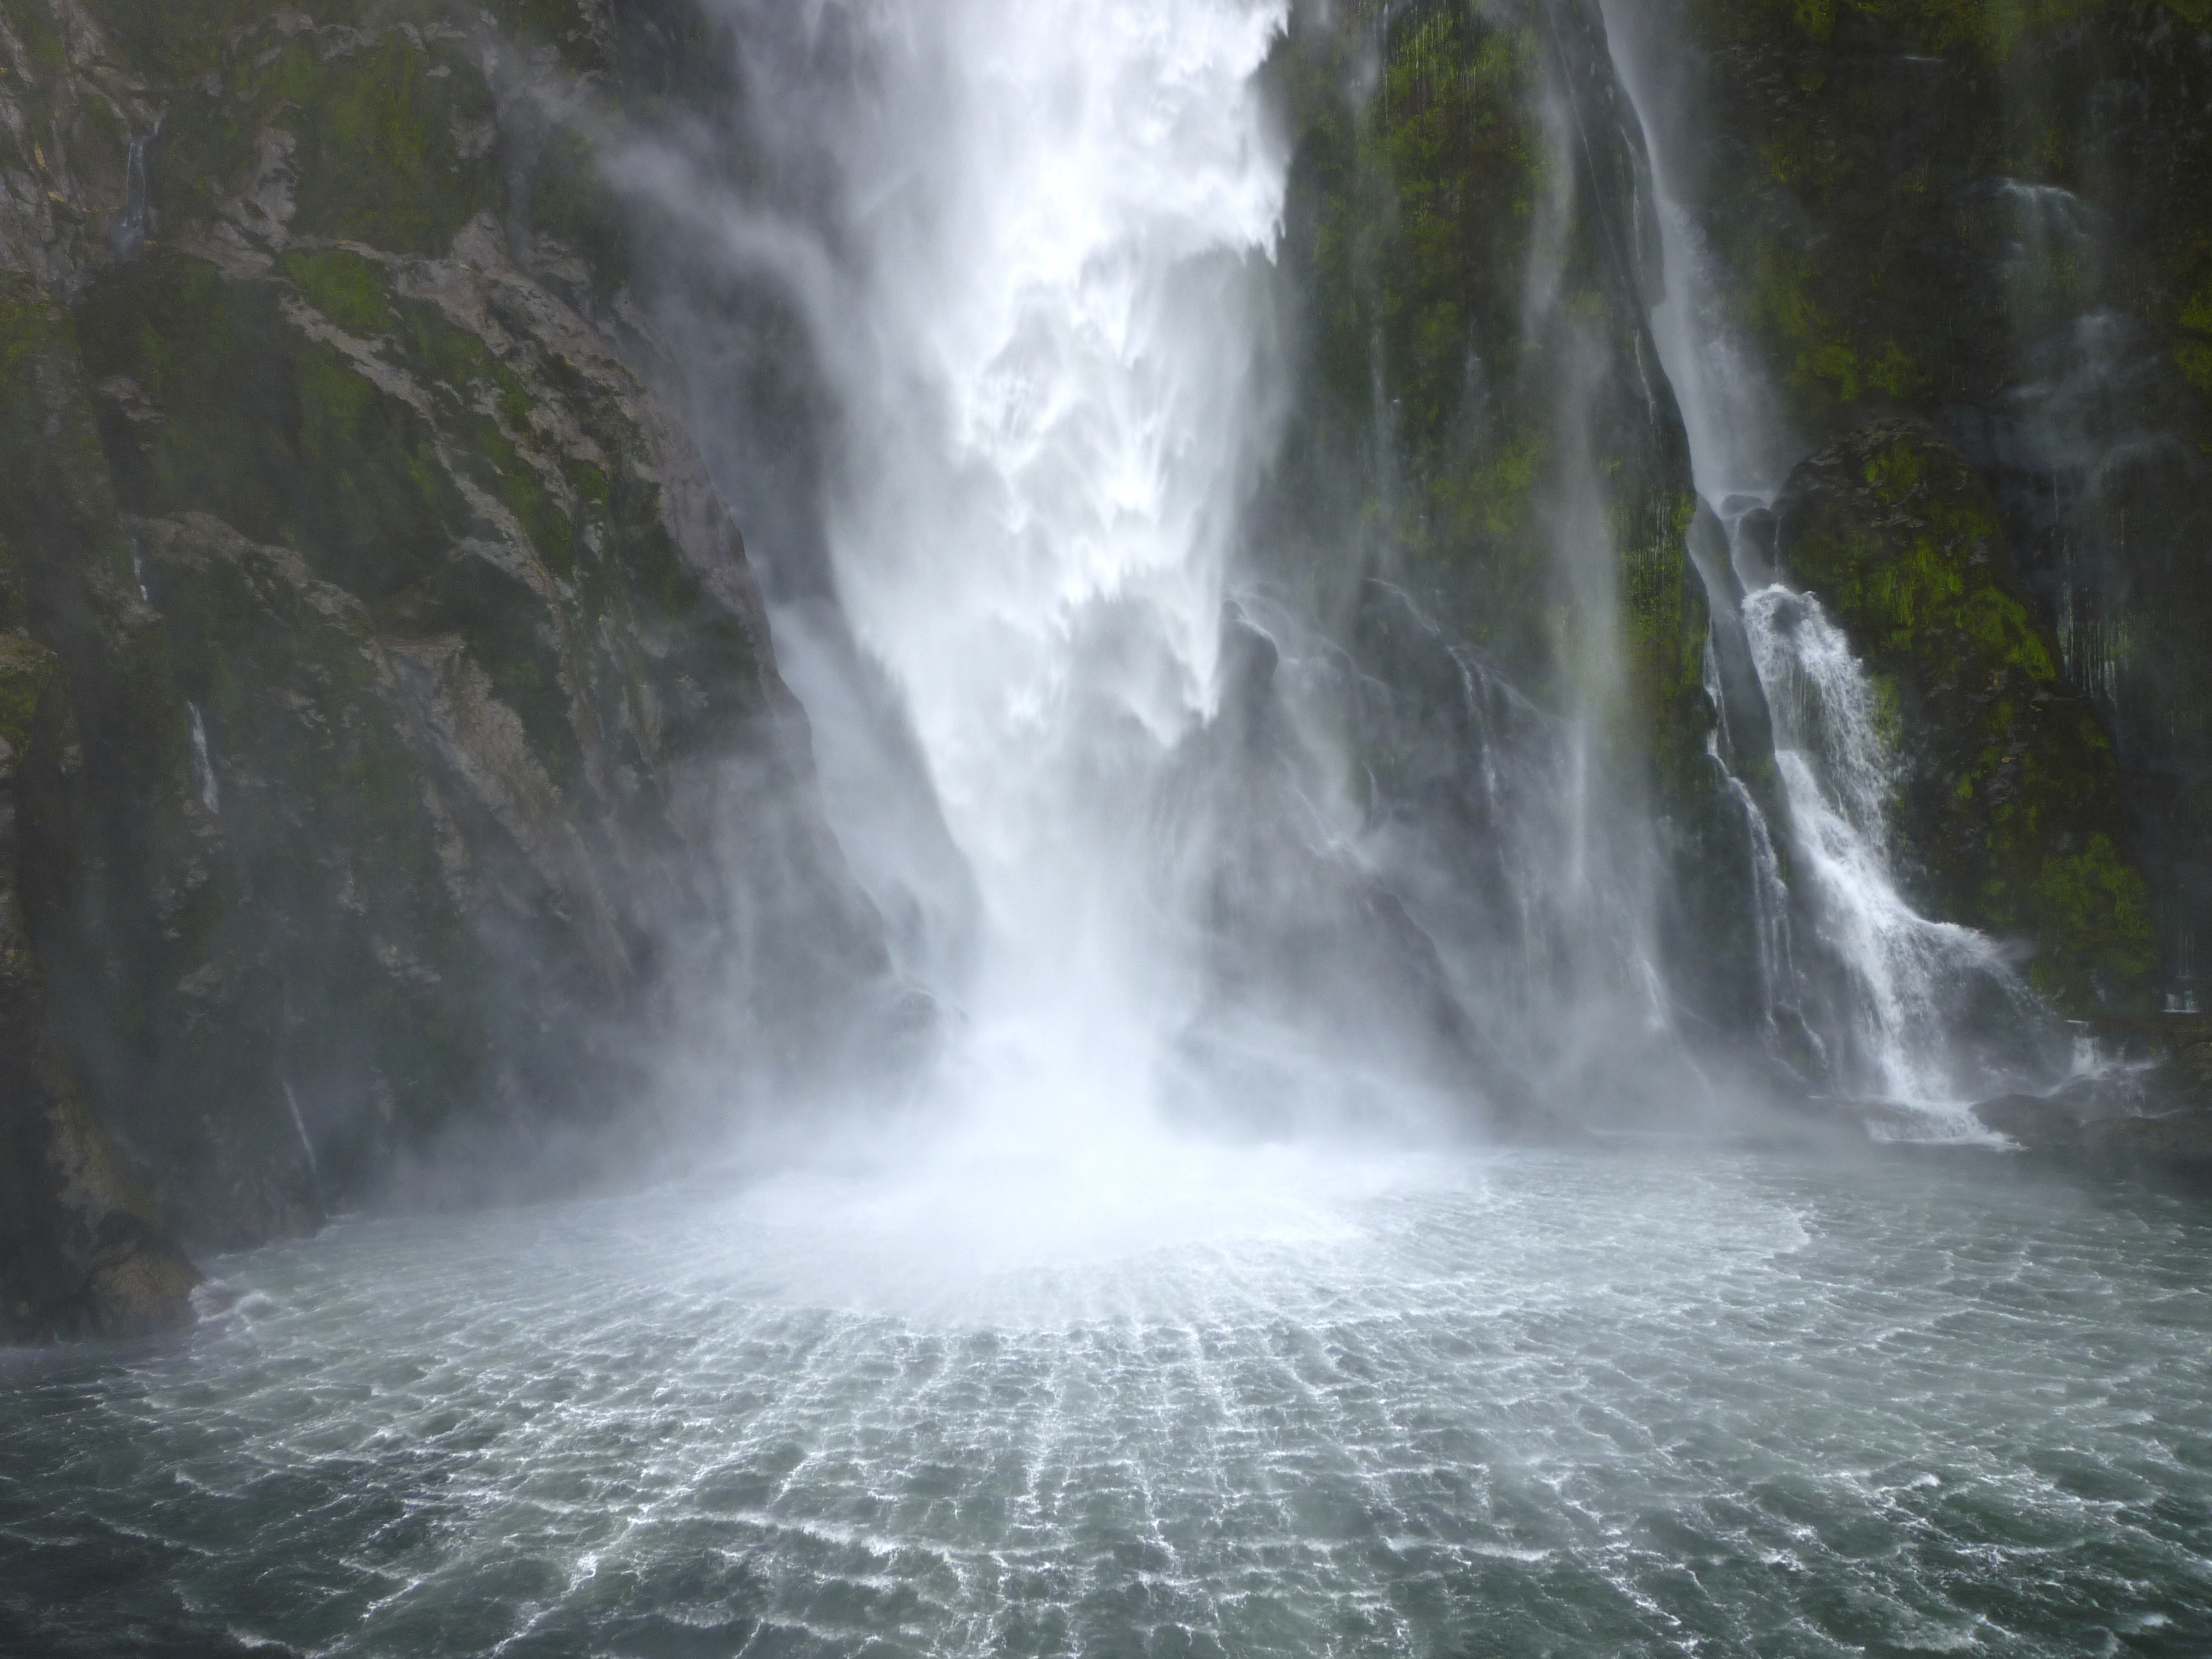 Falling Water Hd Wallpaper Waterfalls Dayna S Blog